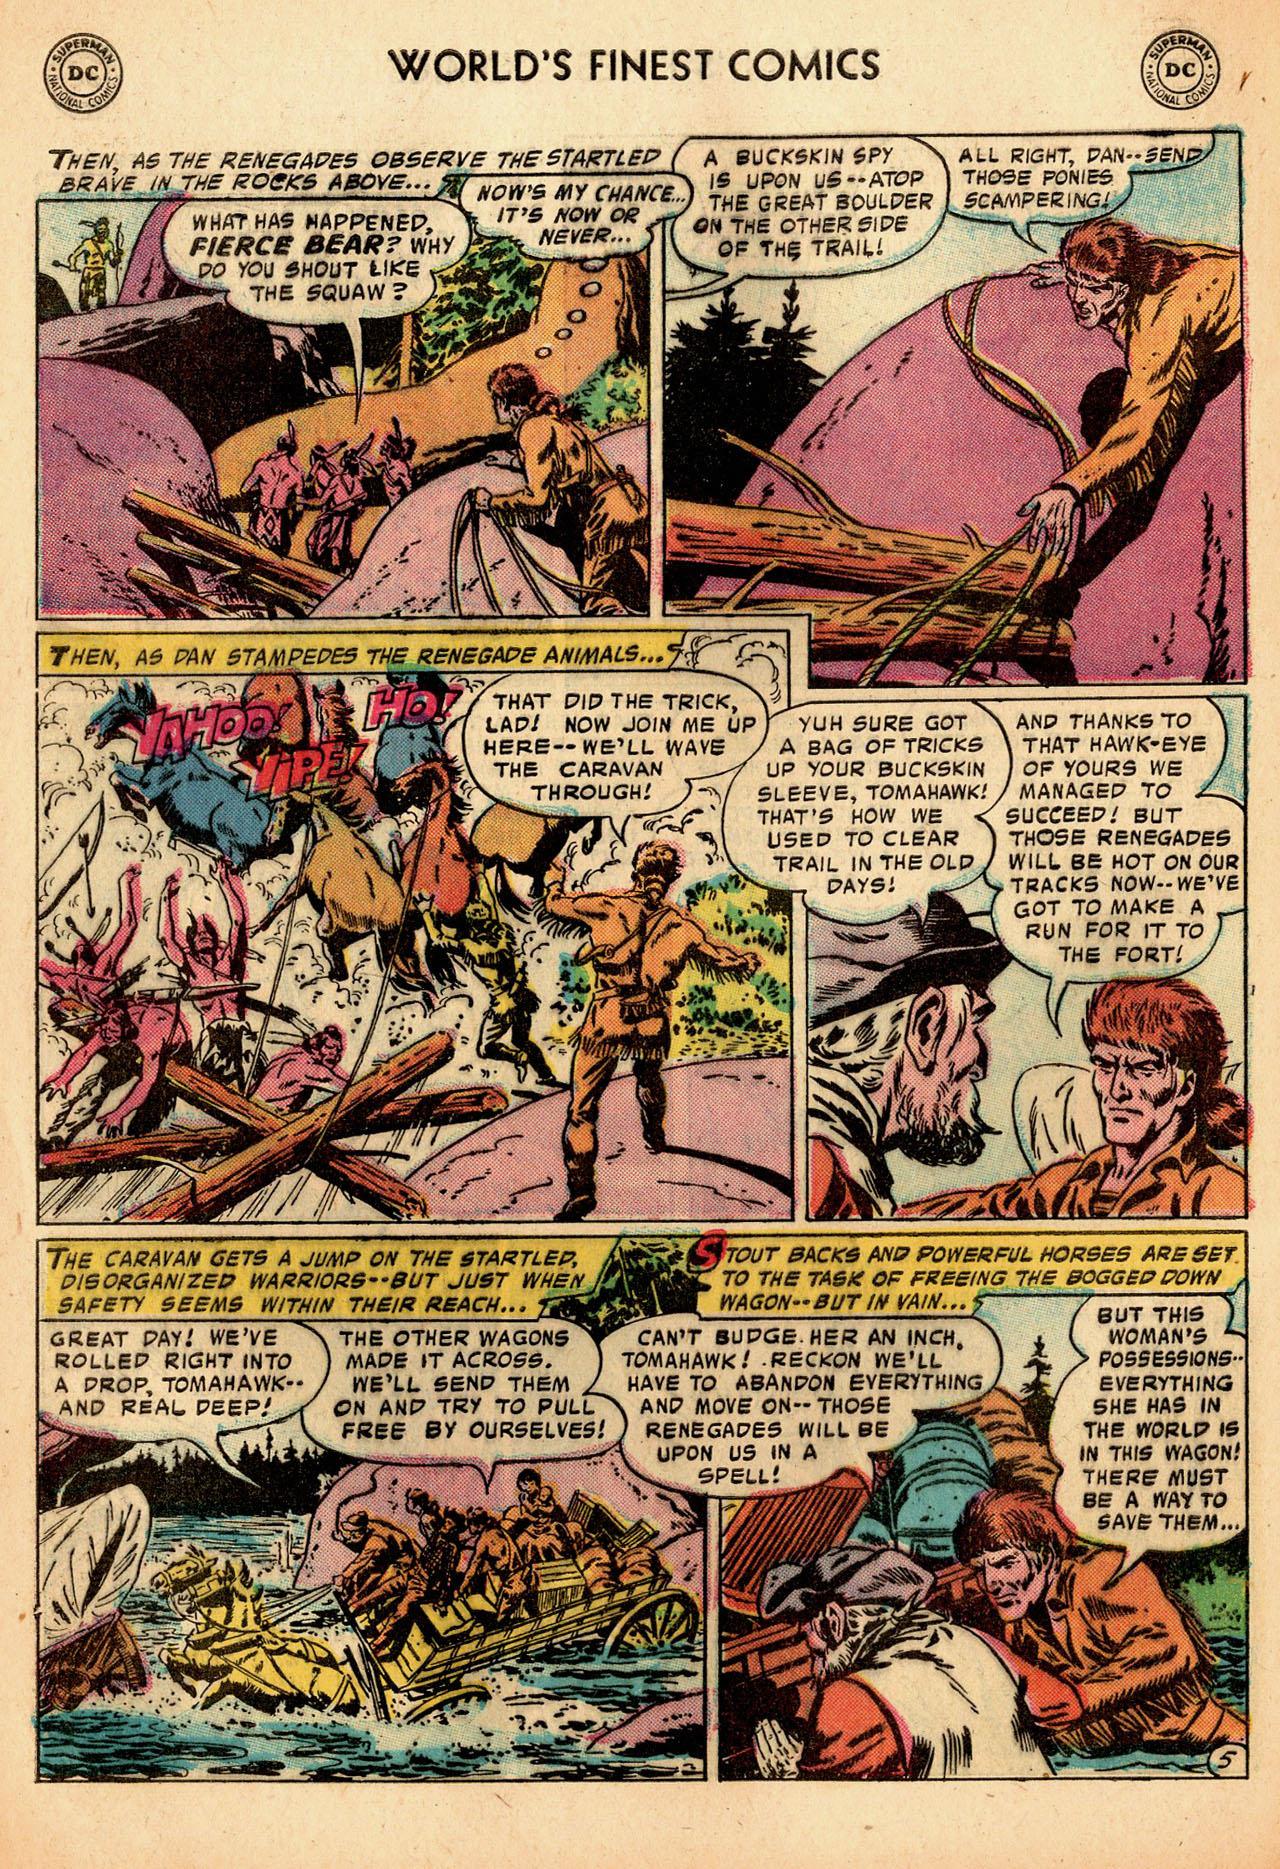 Read online World's Finest Comics comic -  Issue #91 - 32